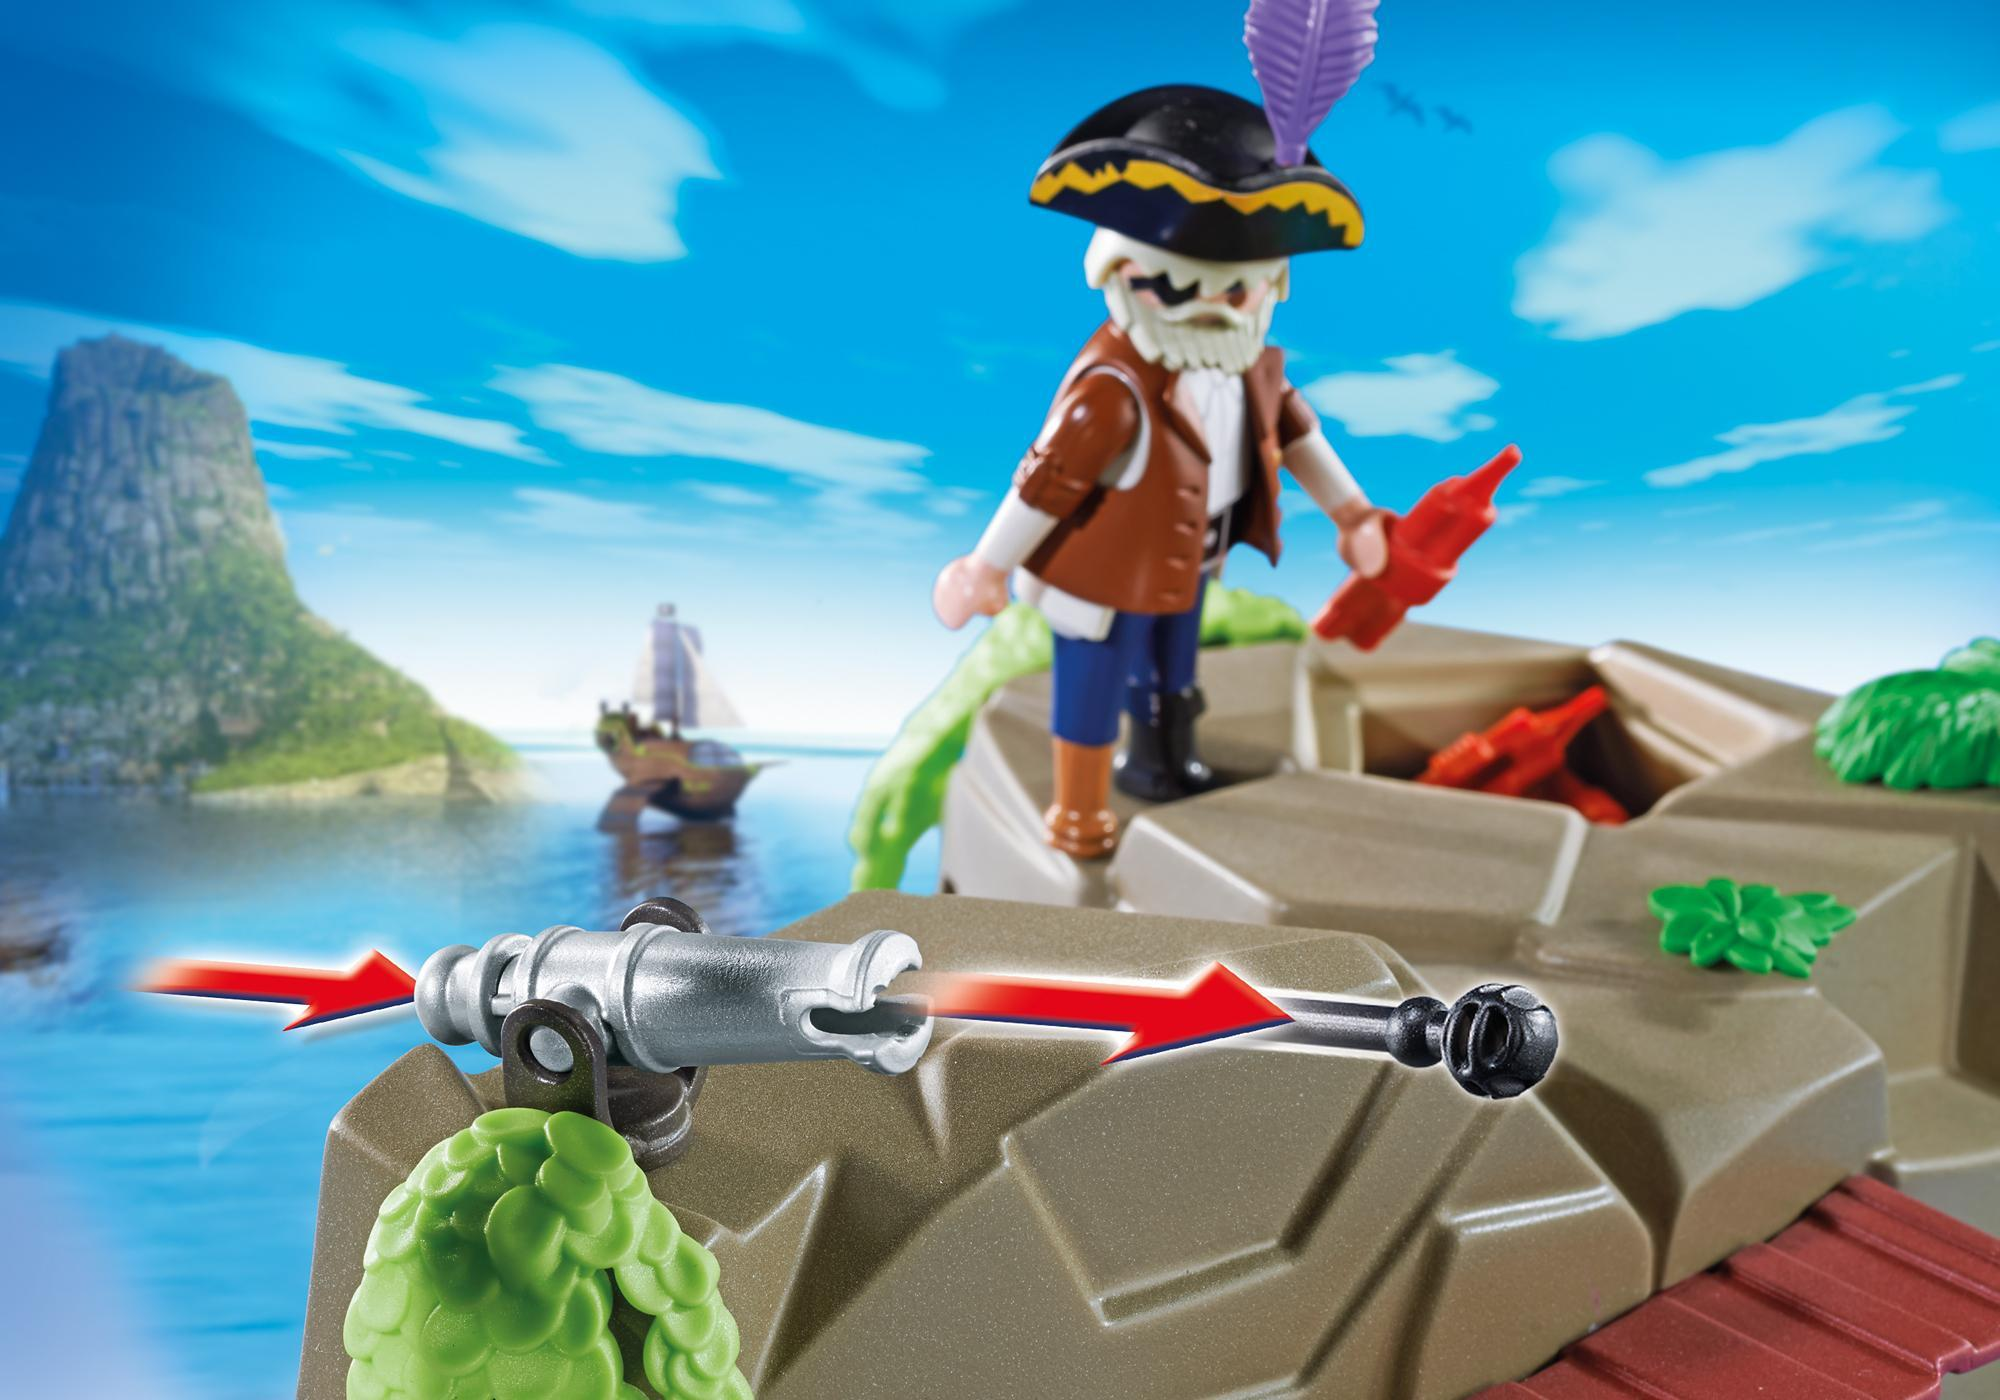 http://media.playmobil.com/i/playmobil/4797_product_extra2